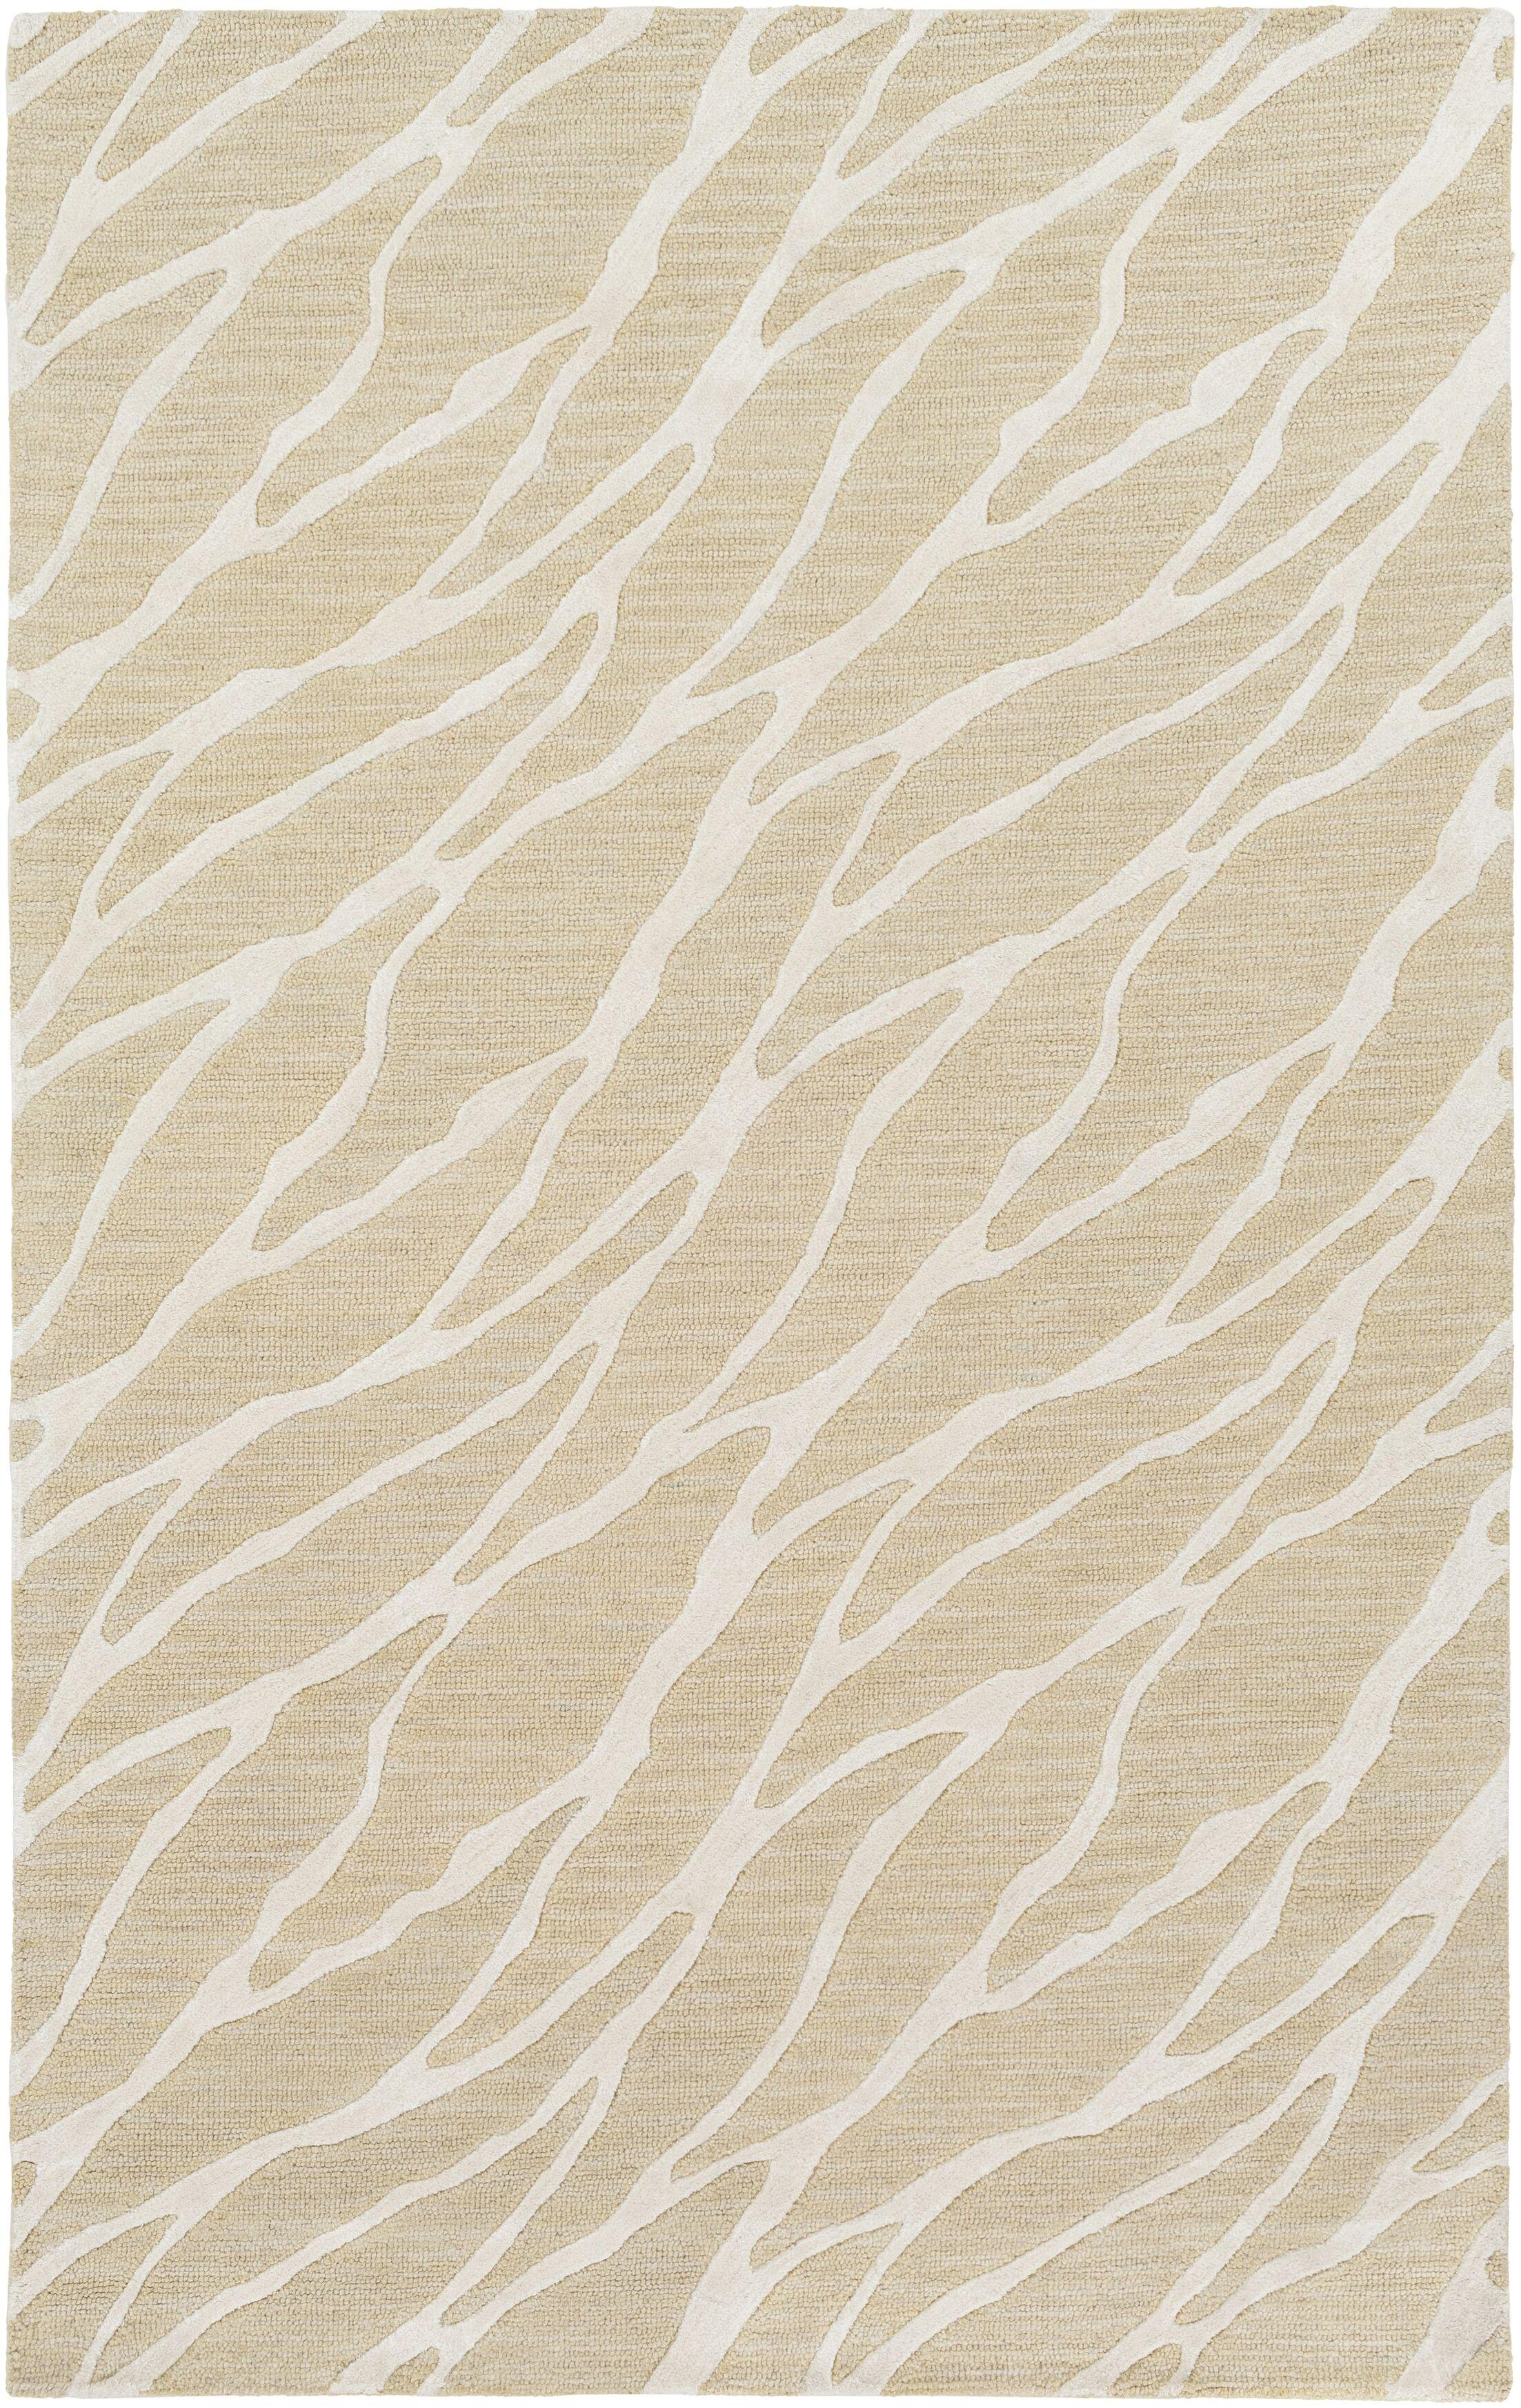 Blewett Hand-Tufted Beige/Ivory Area Rug Rug Size: Rectangle 9' x 13'